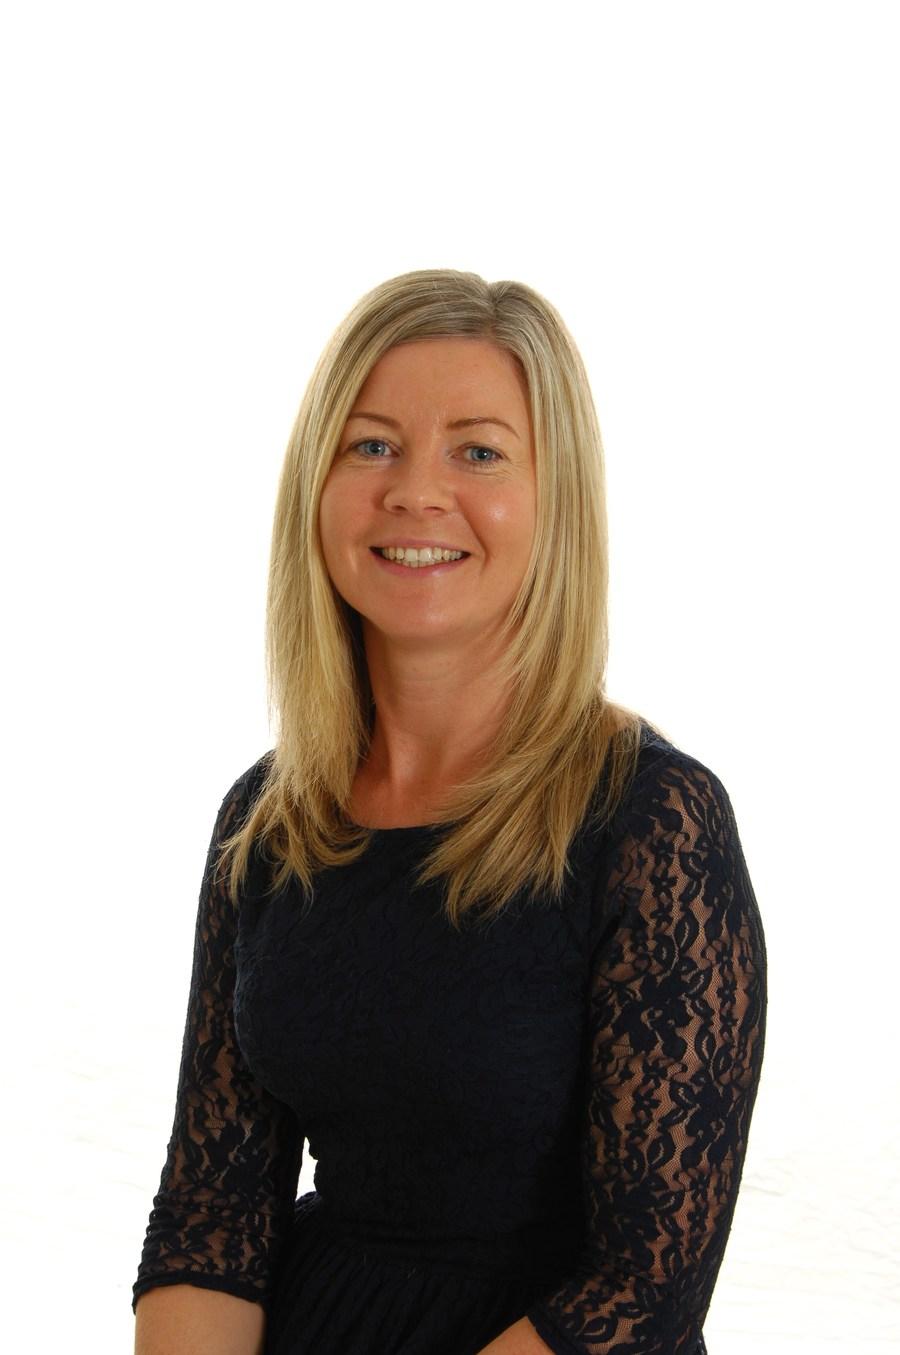 Claire Breen, Acting Principal